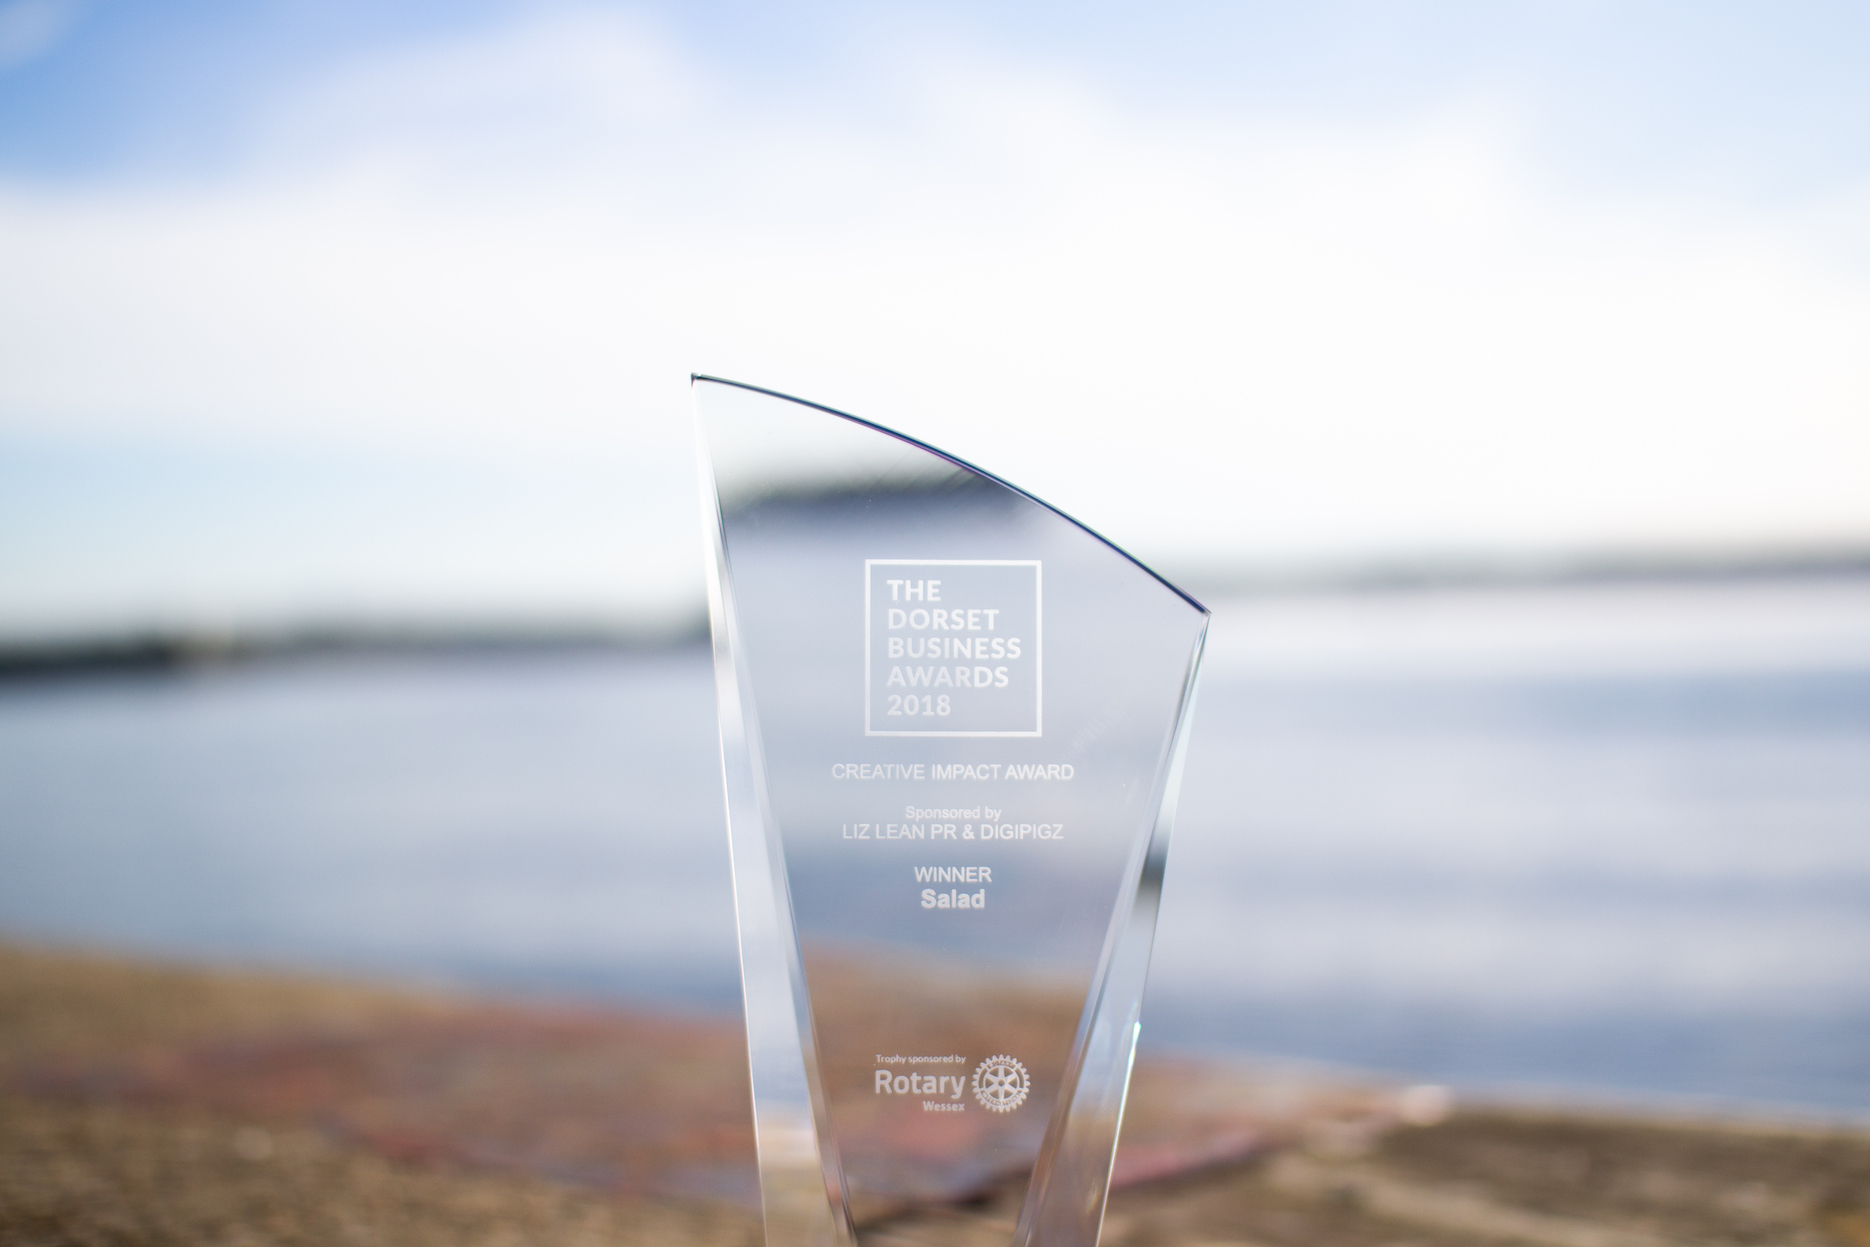 Salad and Team England win Creative Impact Award